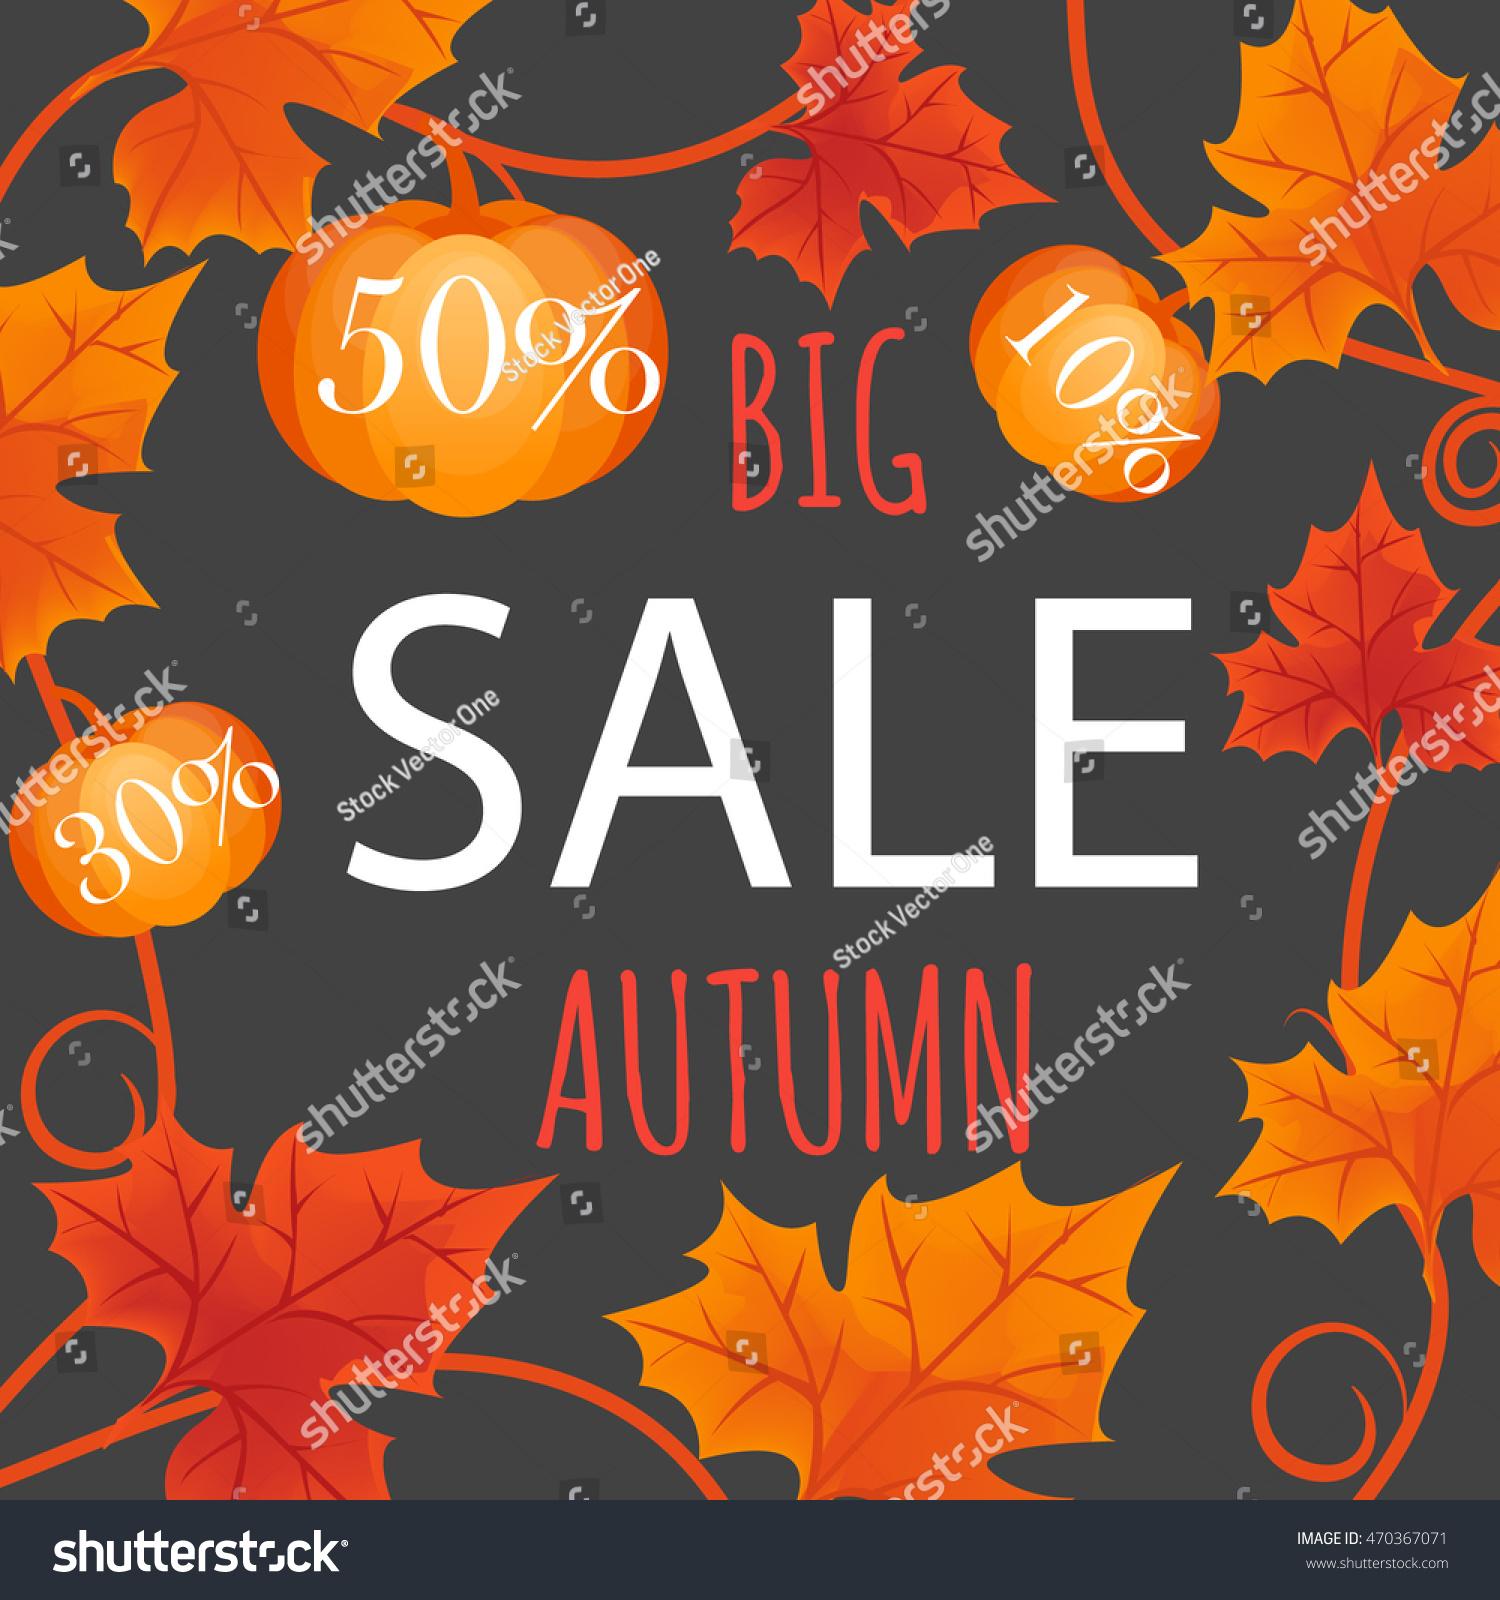 big autumn sale fall leaves pumpkin のベクター画像素材